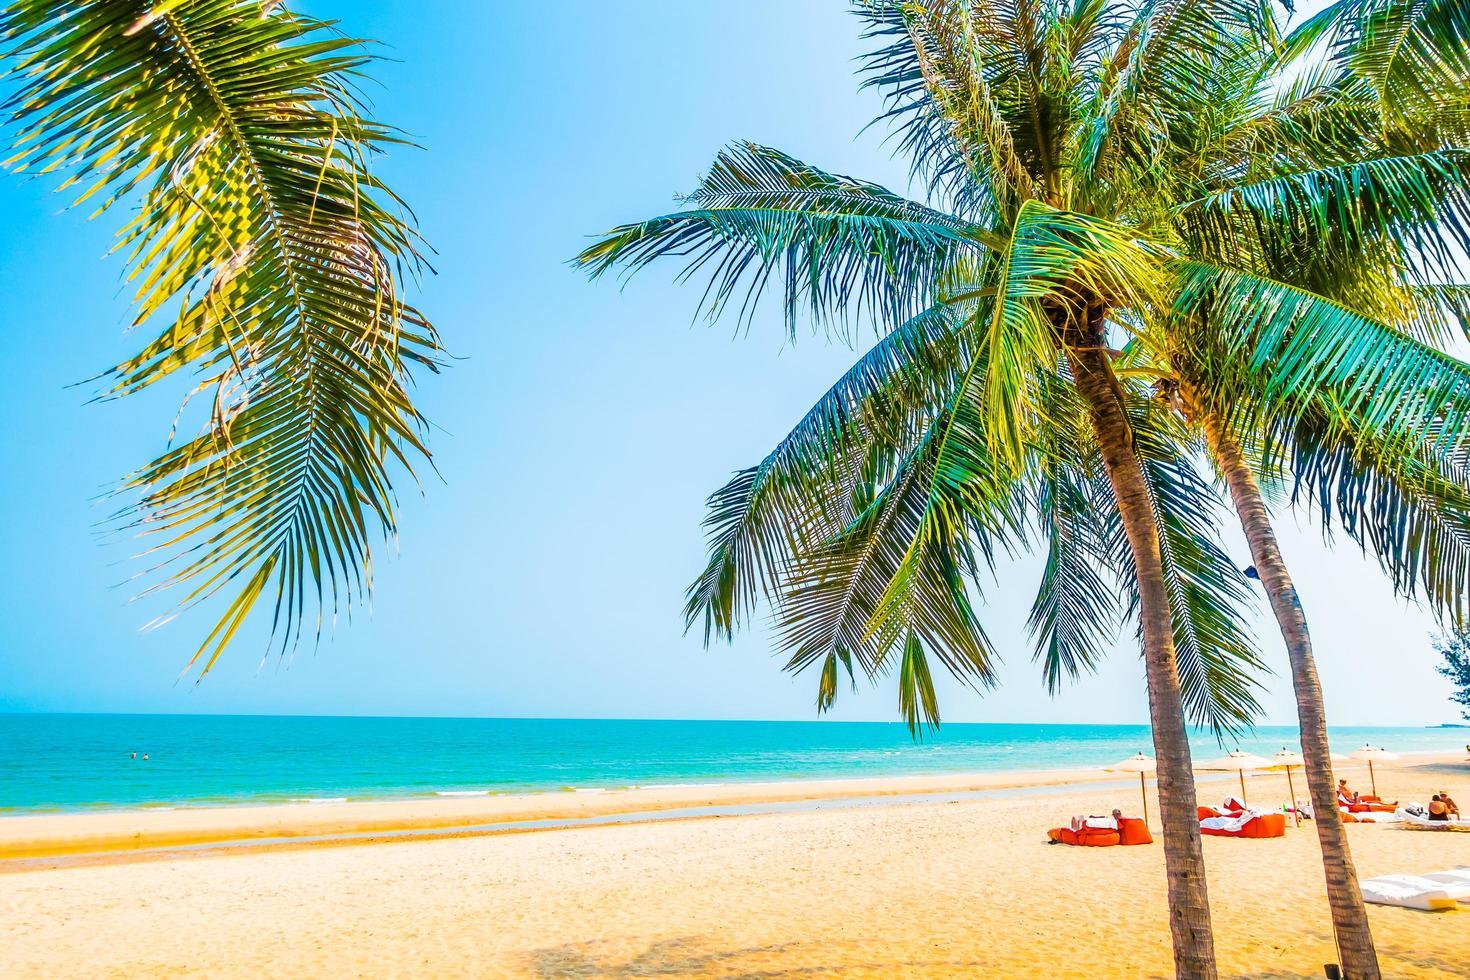 hermosa palmera en la playa foto